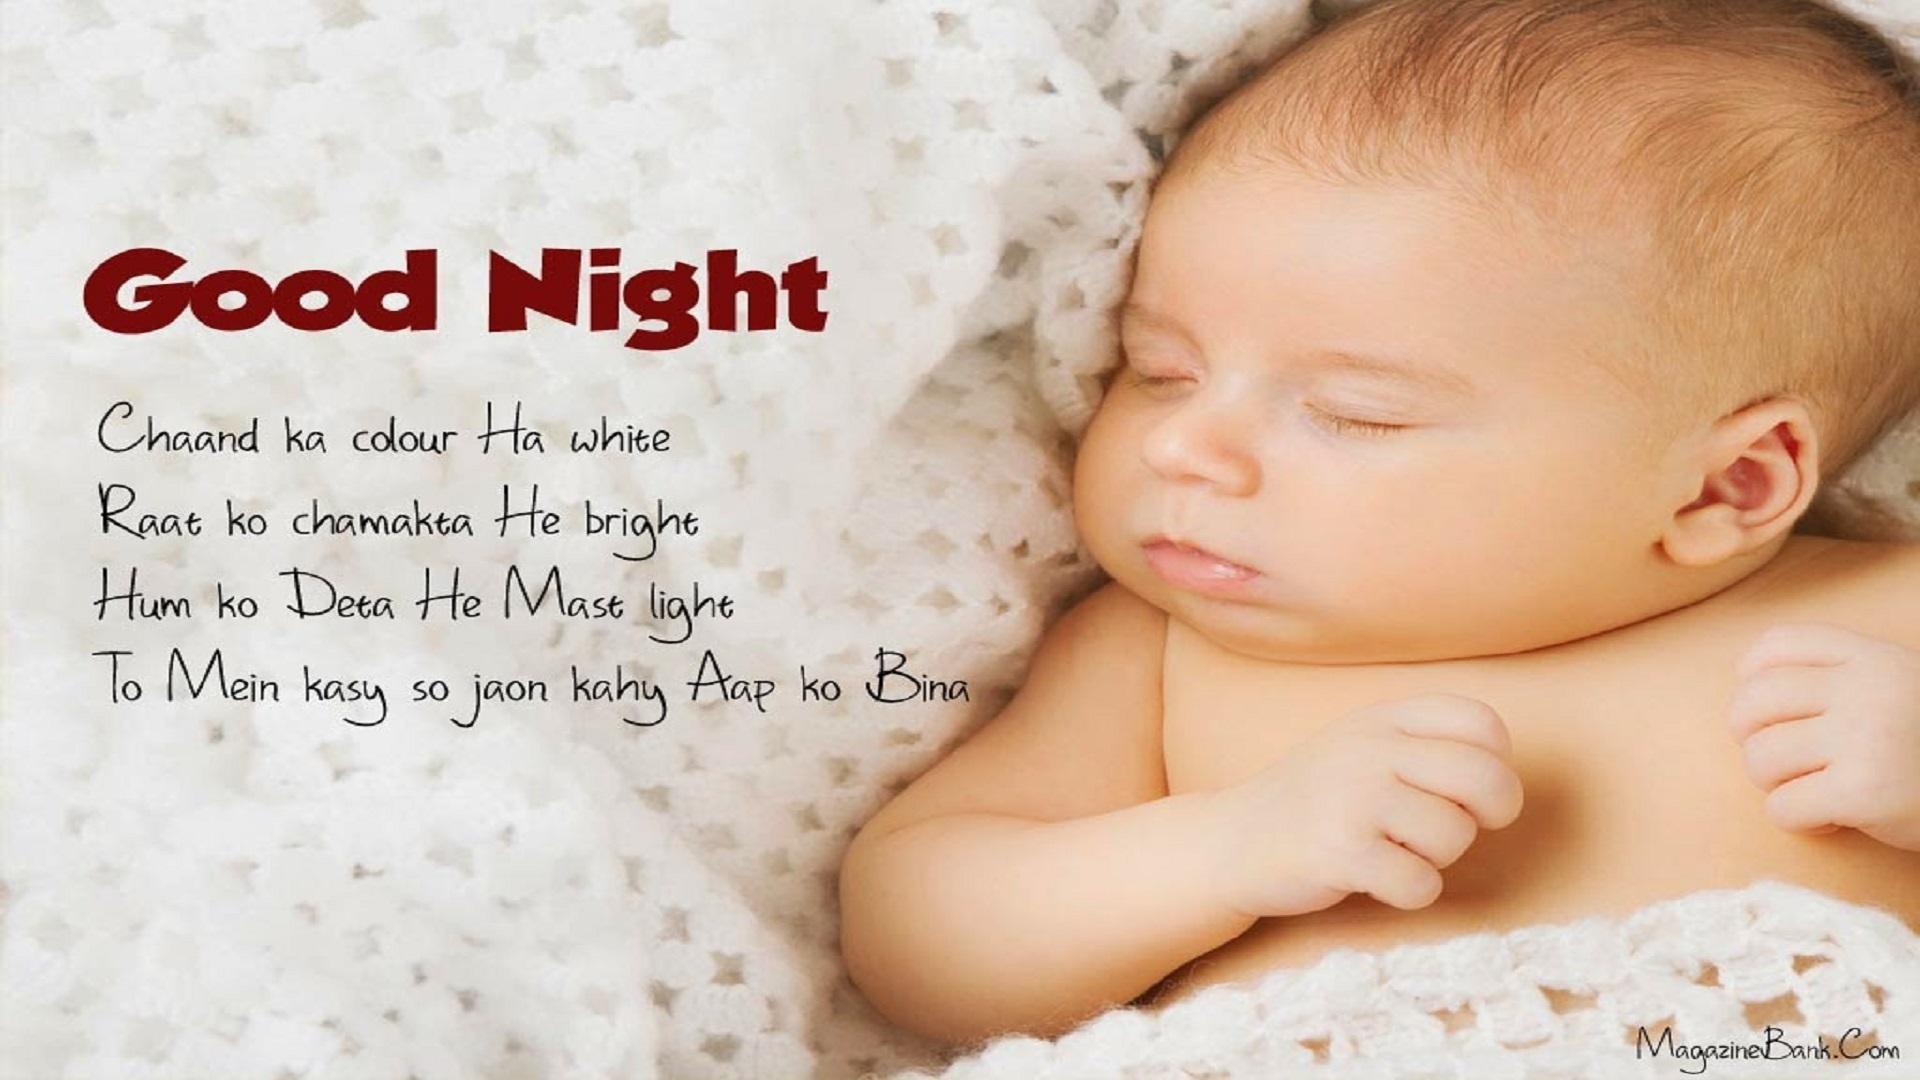 Good Night Well Sleep Hd Free Wallpapers Downloaded Hd Wallpaper